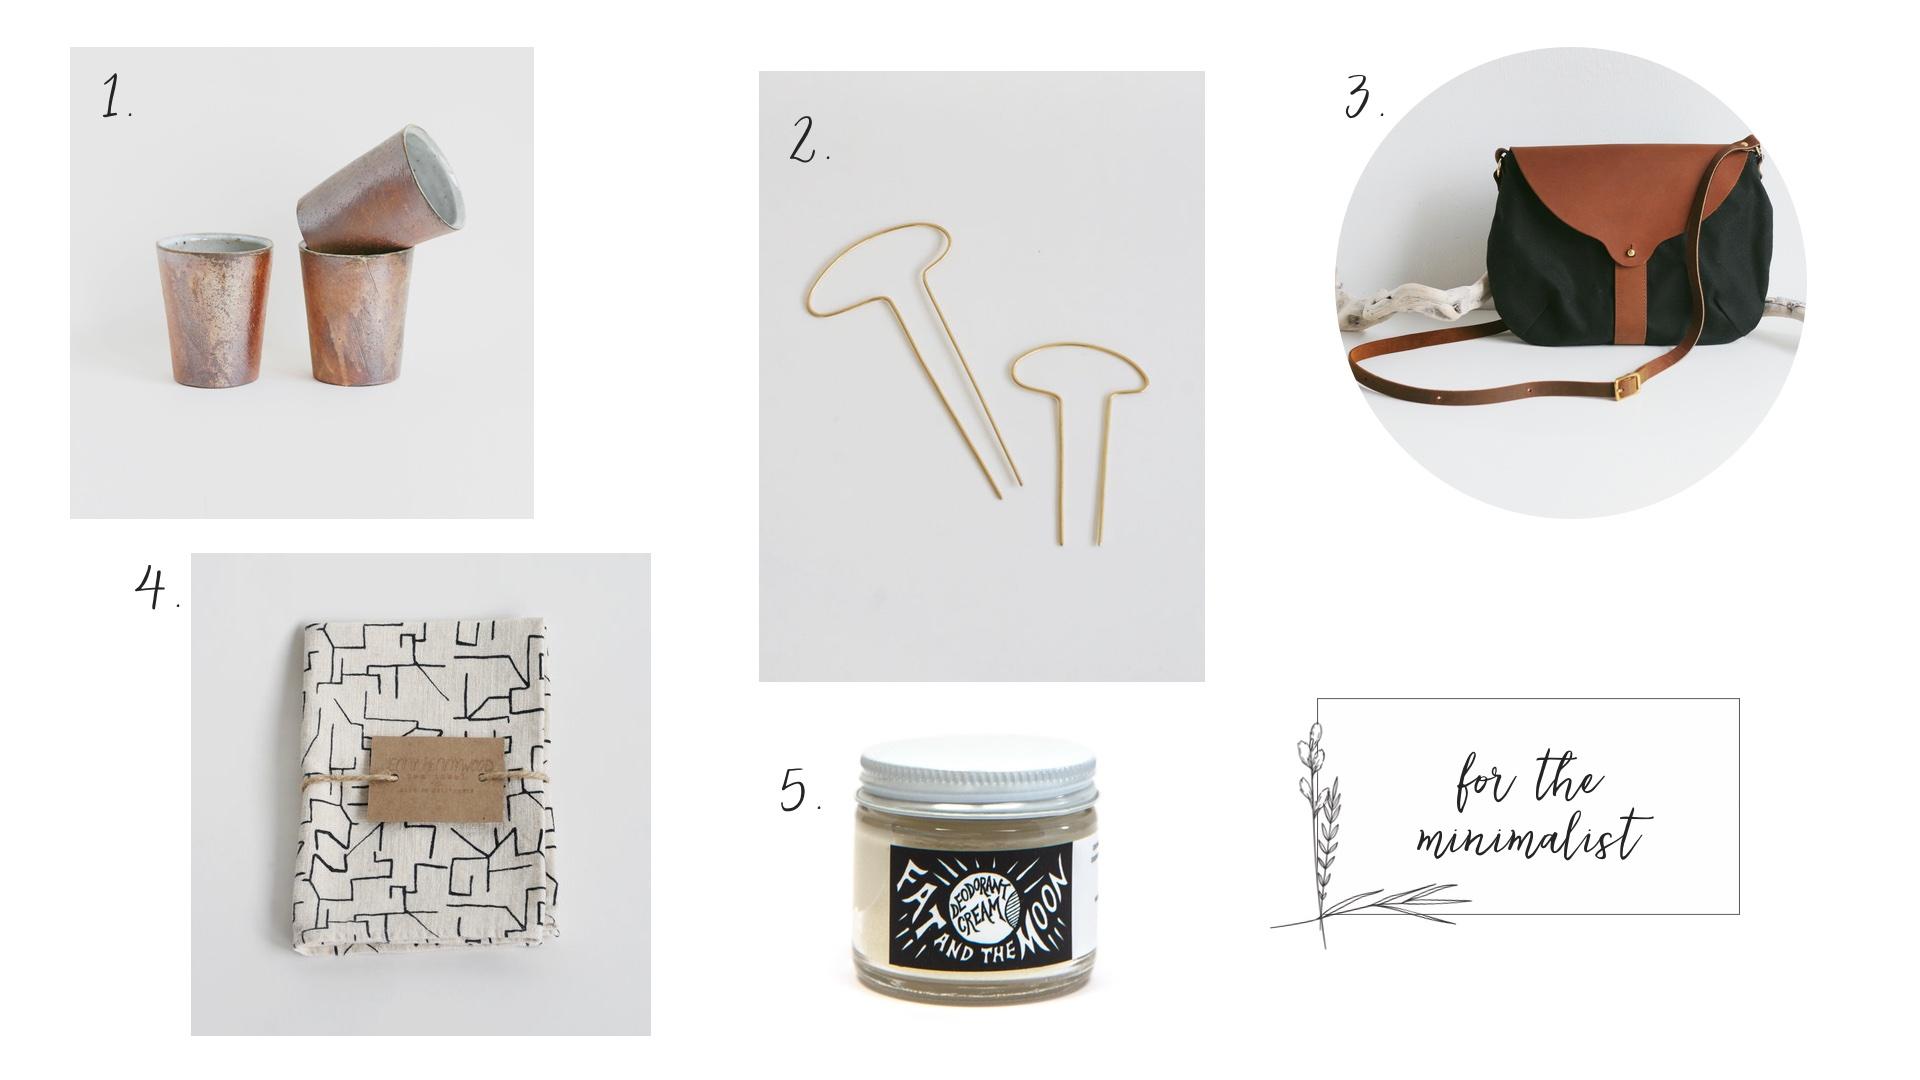 1.  Earthy   Tumblers  2.  Maze Tea Towel  3.  Brass Oblong Hairpins  4.  All Natural Deodorant Cream  5.  Taplin Purse